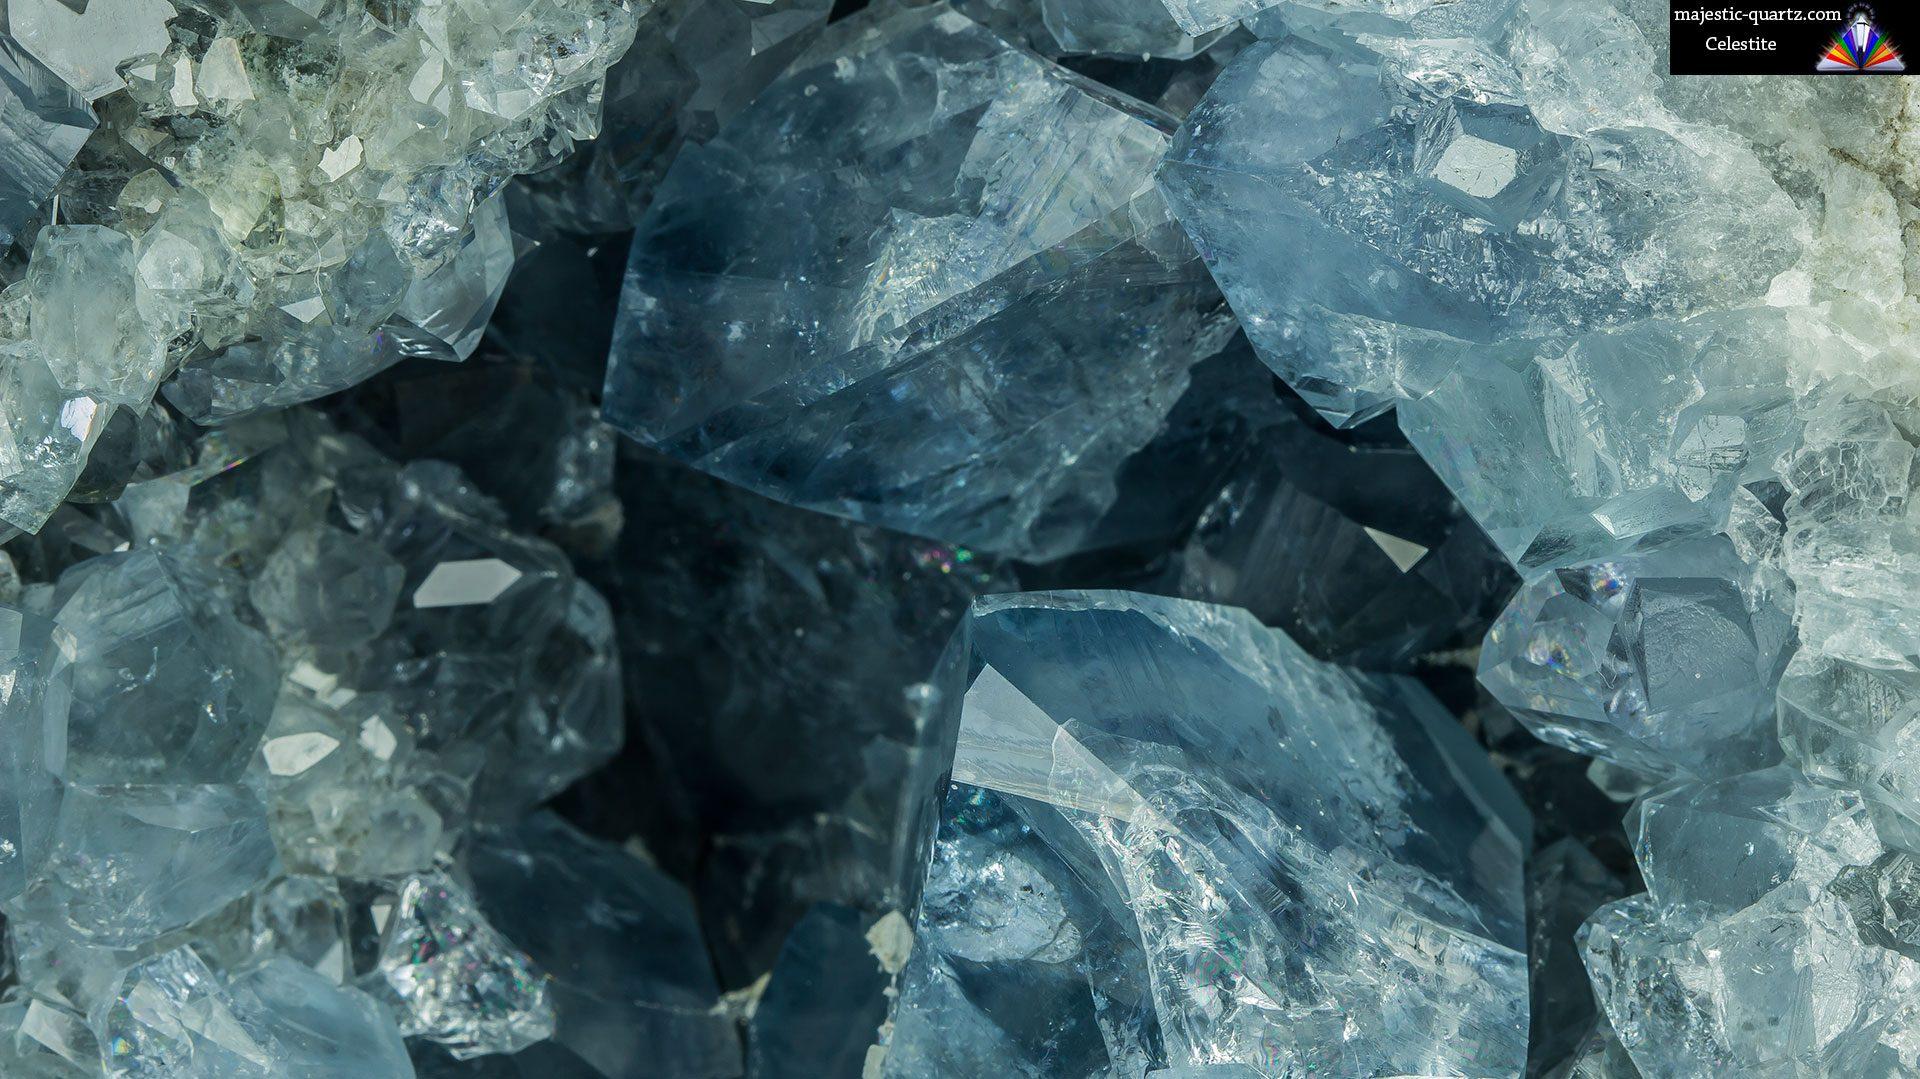 Celestite Crystal Geode Specimen - Photograph by Anthony Bradford